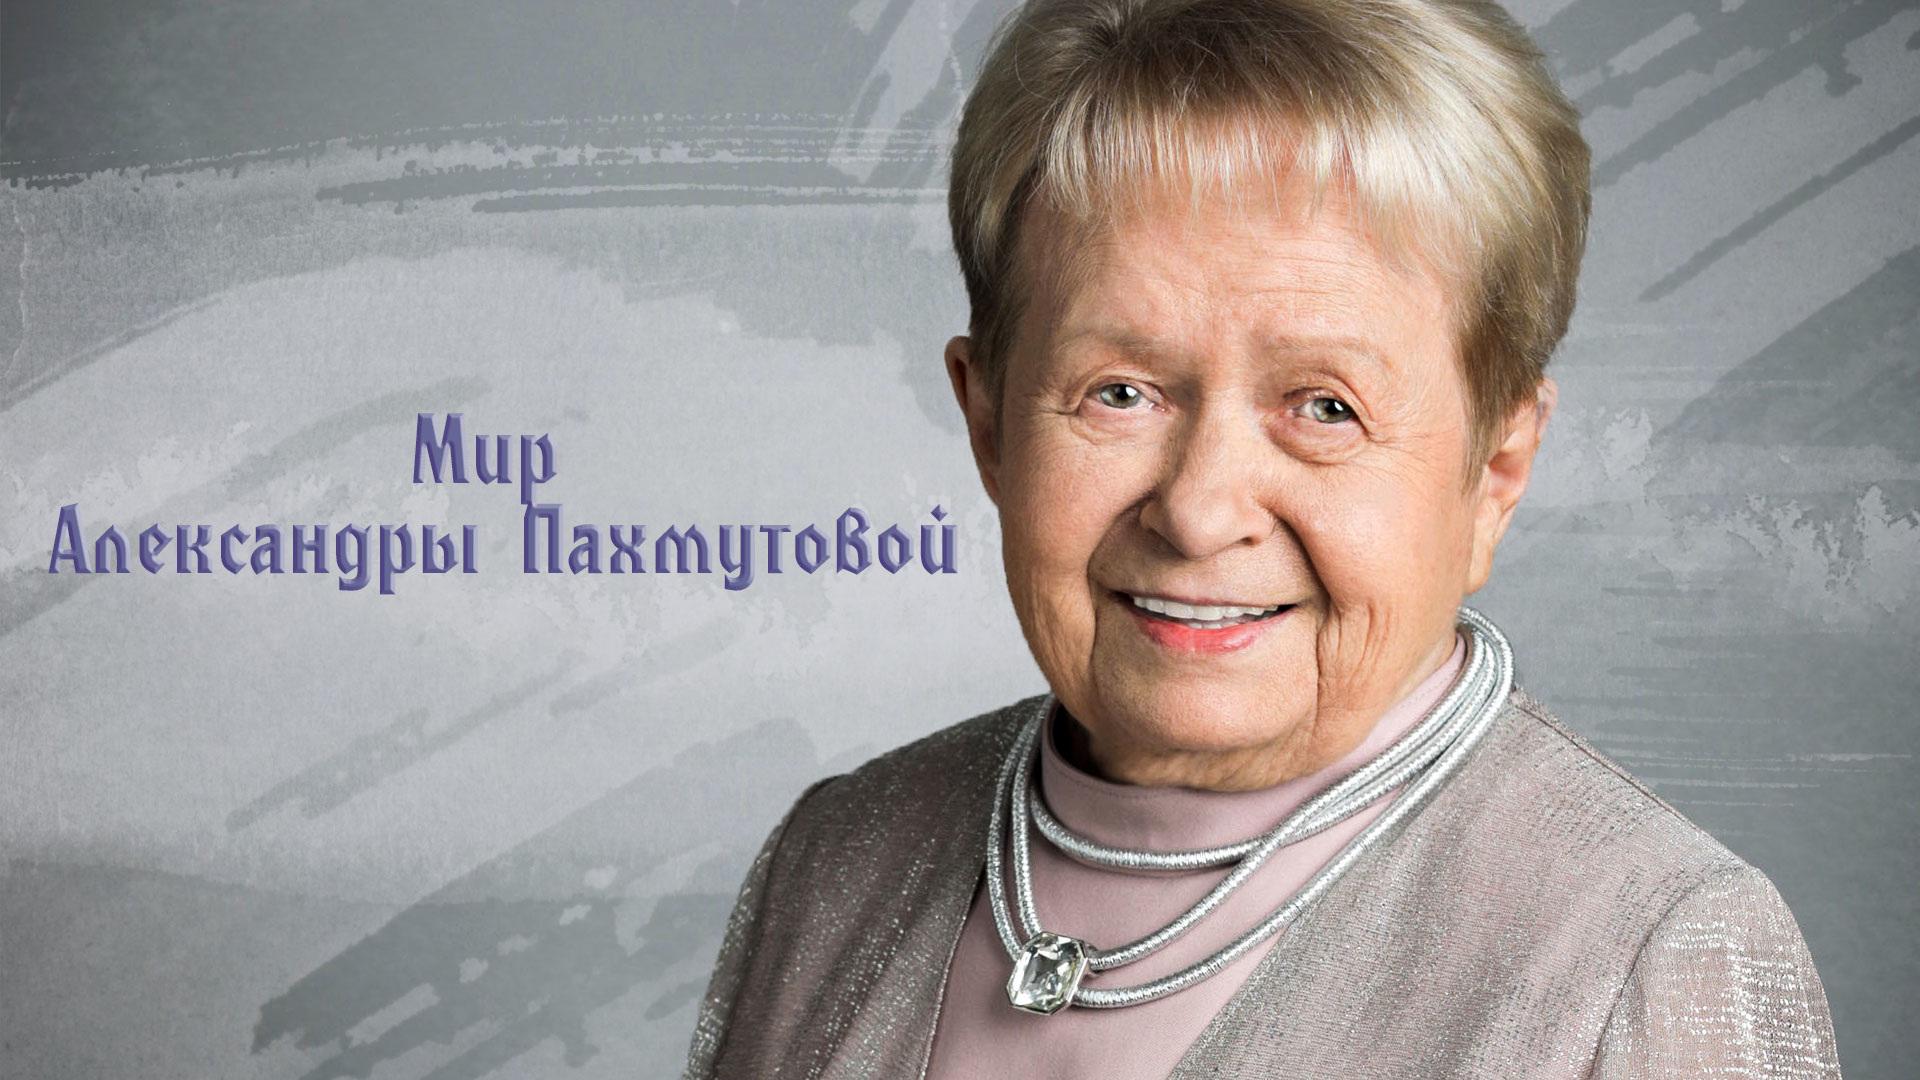 Мир Александры Пахмутовой